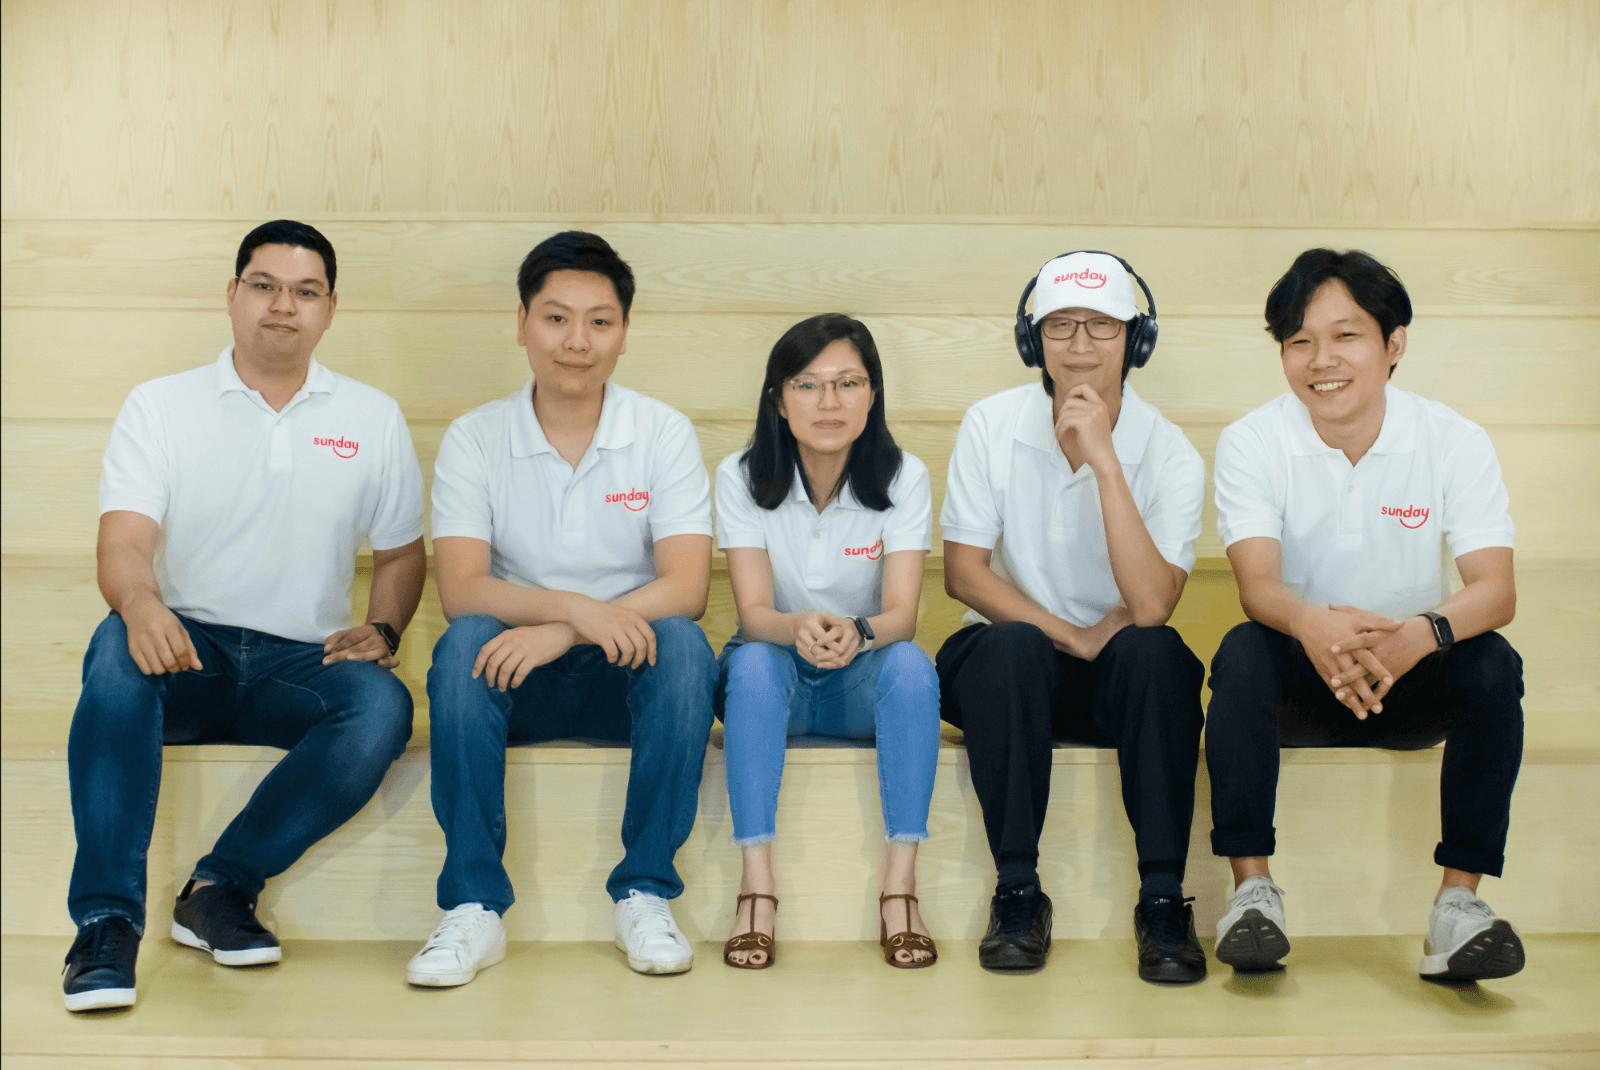 Thai insurtech startup Sunday raises $9m as it prepares for Indonesian expansion